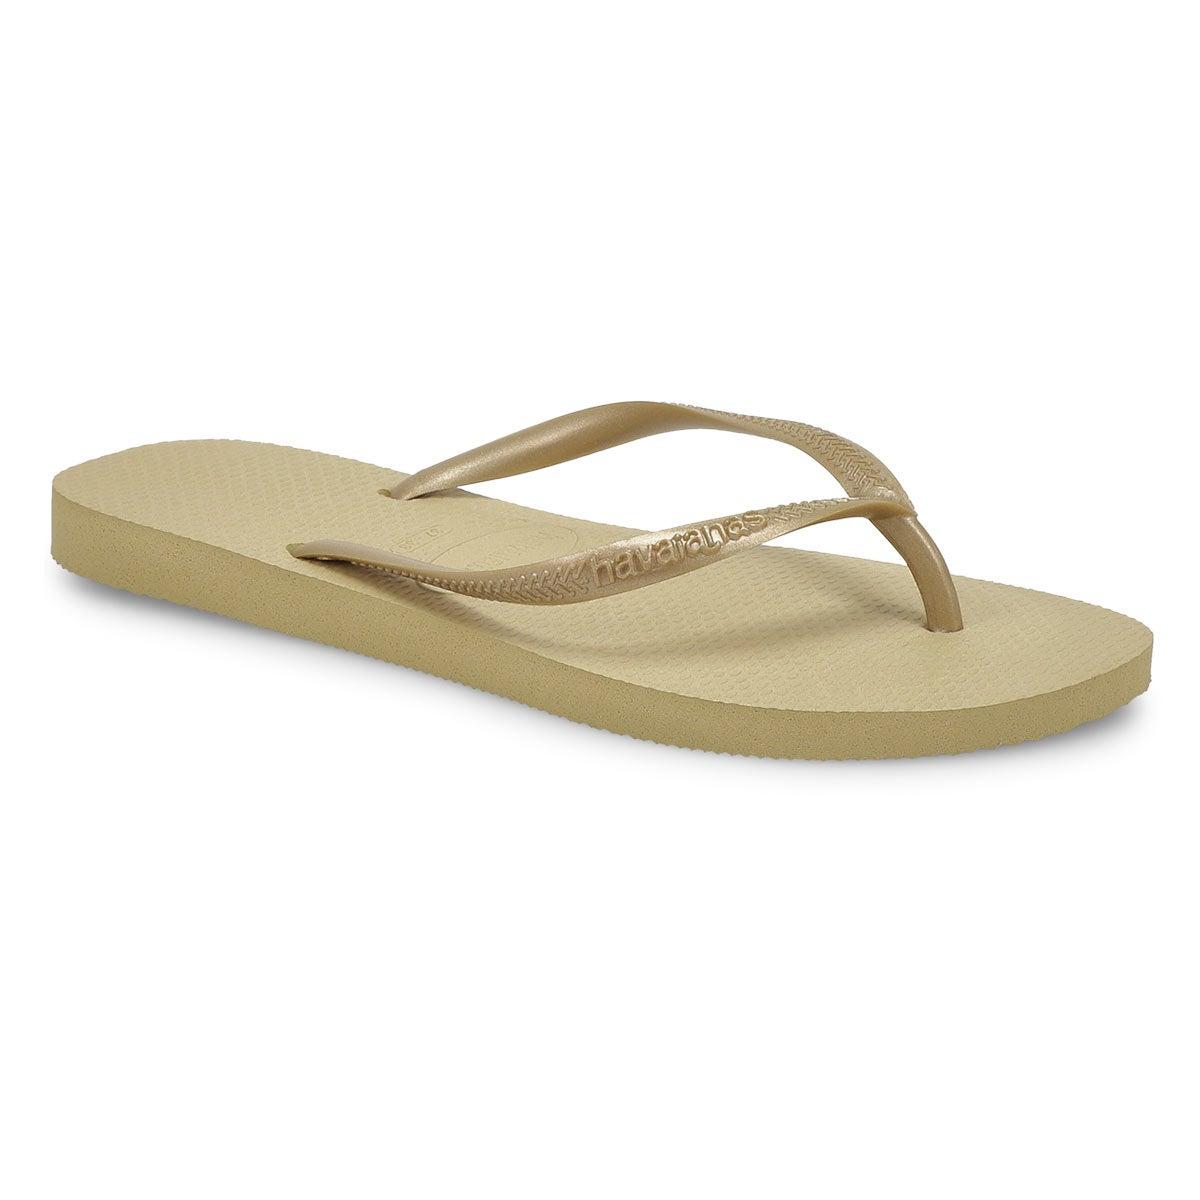 Women's Slim Flip Flop - Sand Grey/Light Golden